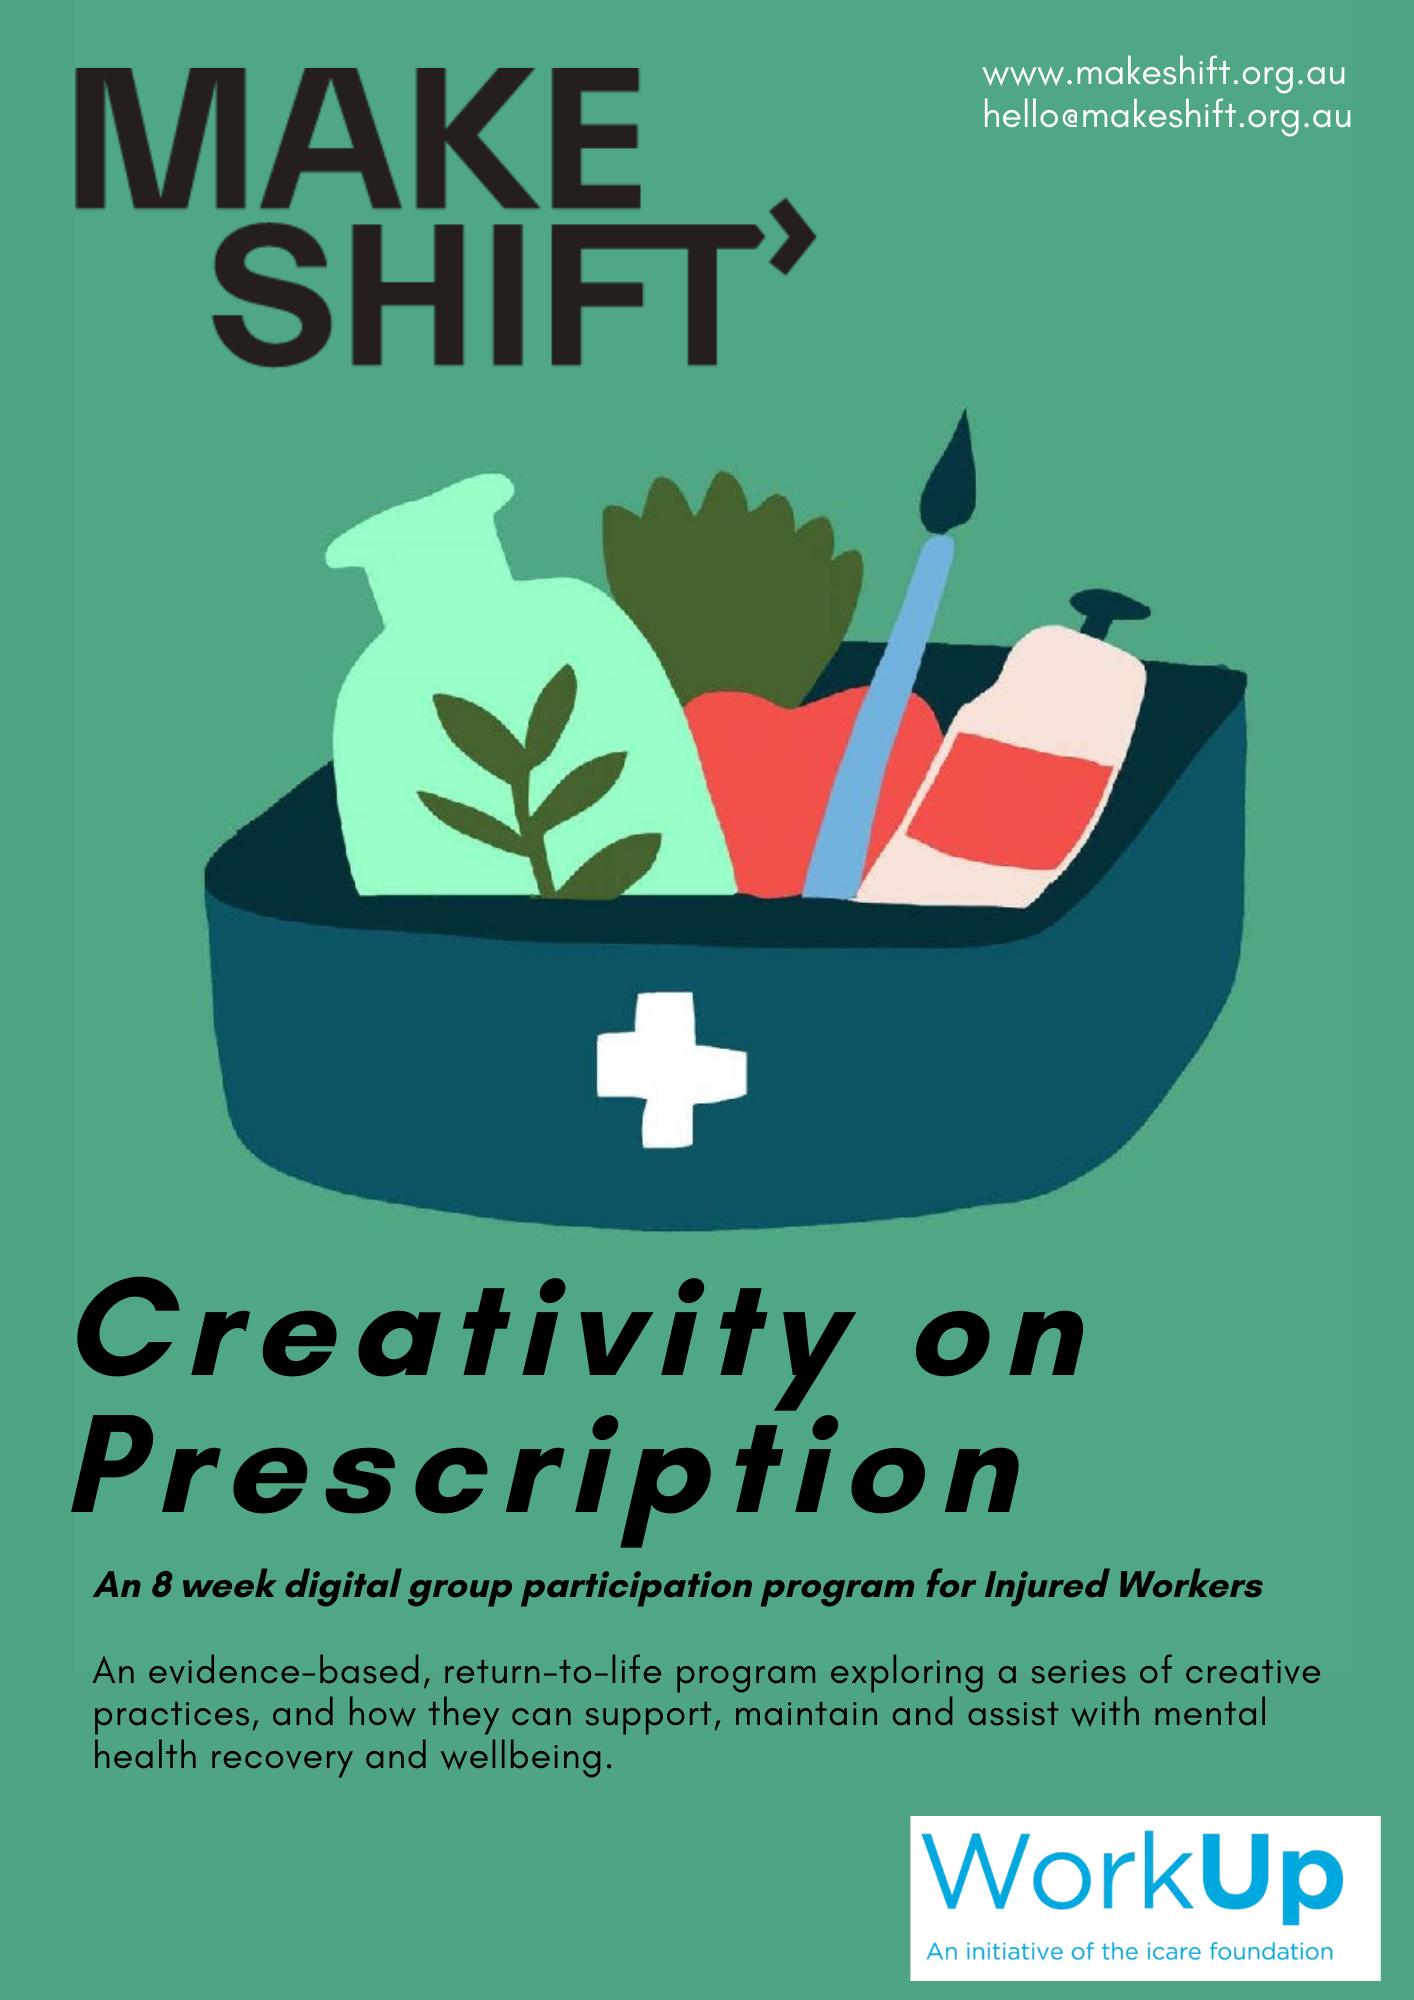 MakeShift ReMind Creativity on Prescription